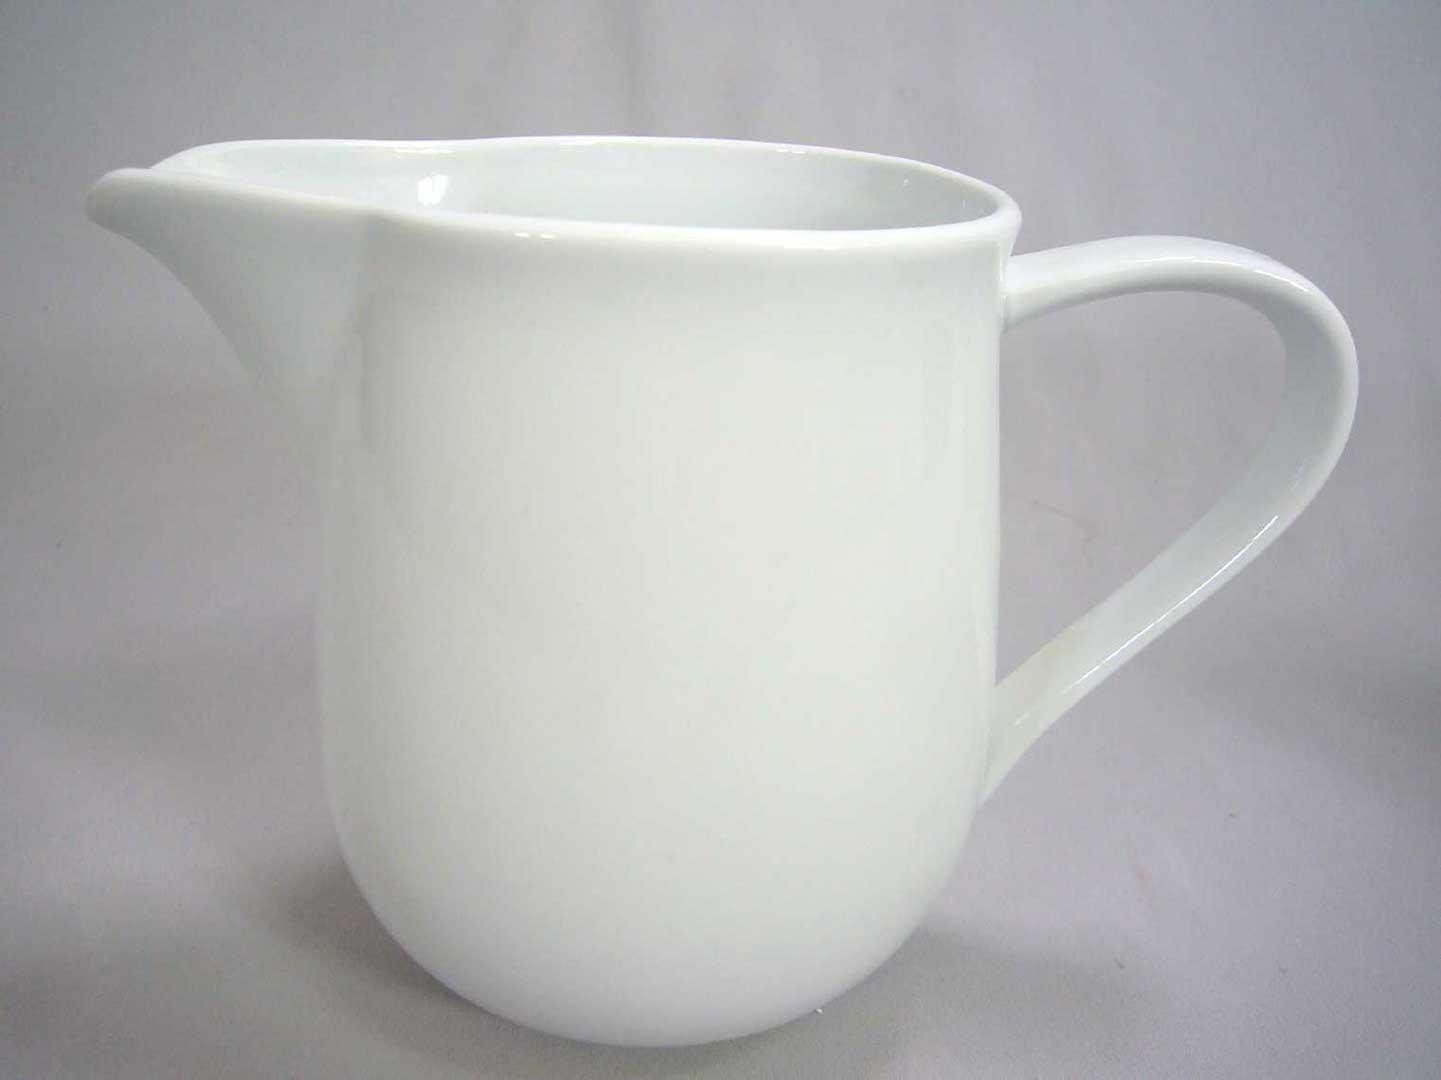 Milchkrug AVANTI